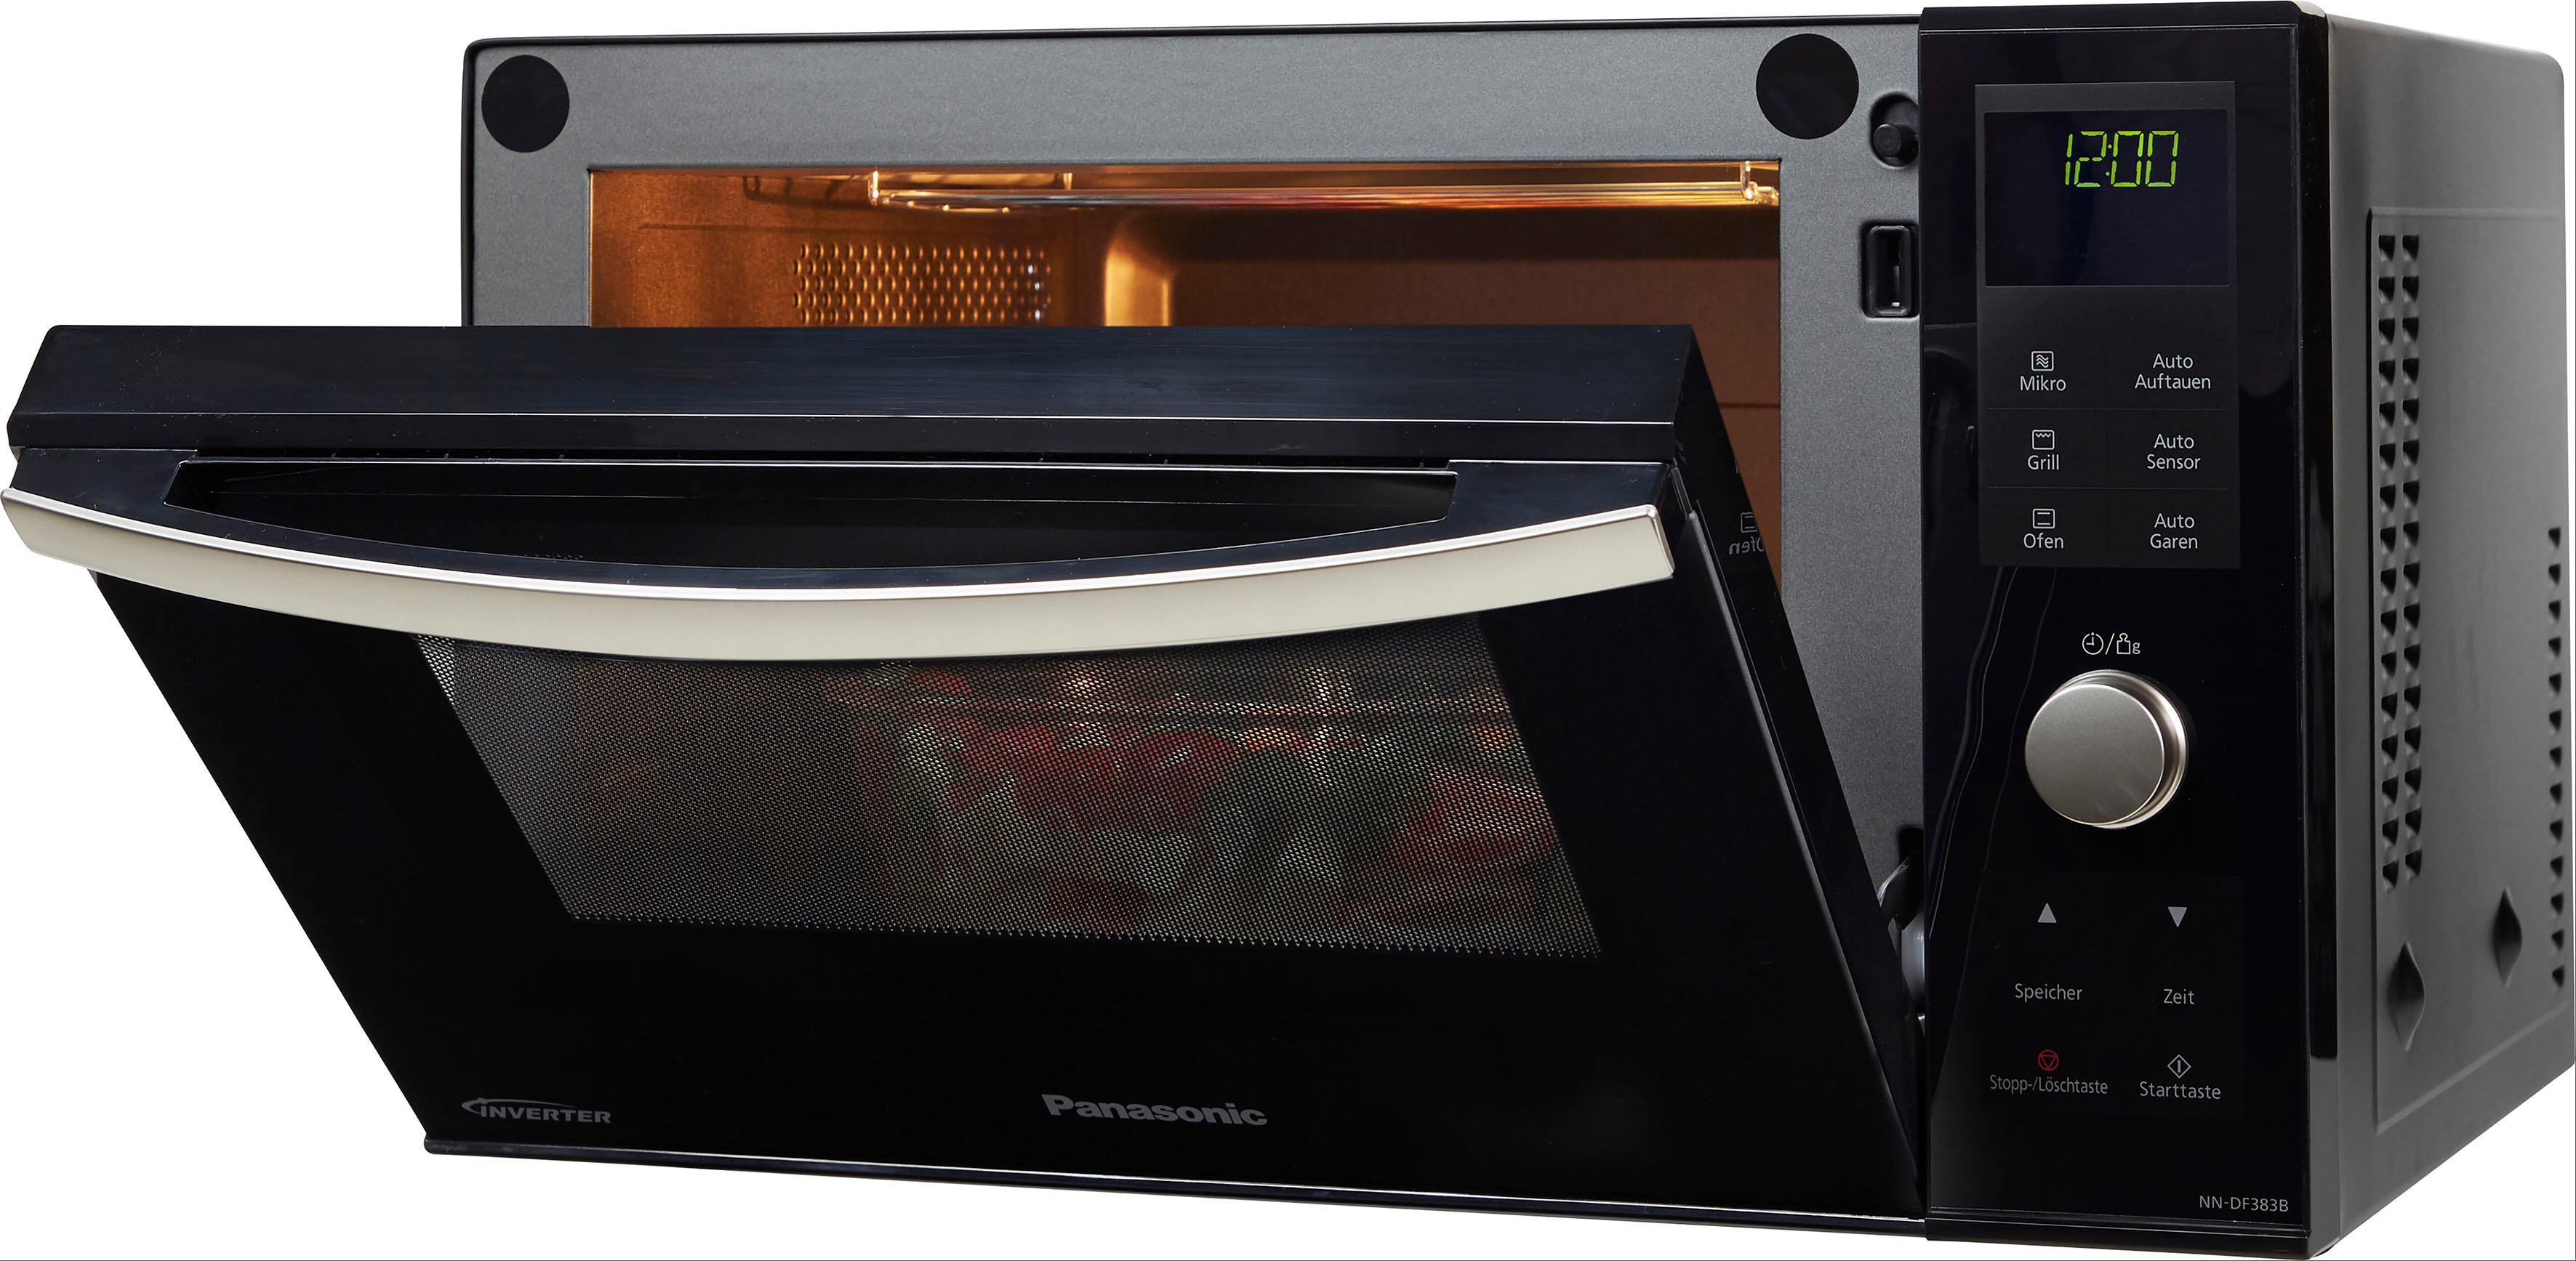 Panasonic Mikrowelle NN-DF383BGPG, 1000 W | Küche und Esszimmer > Küchenelektrogeräte > Mikrowellen | Panasonic